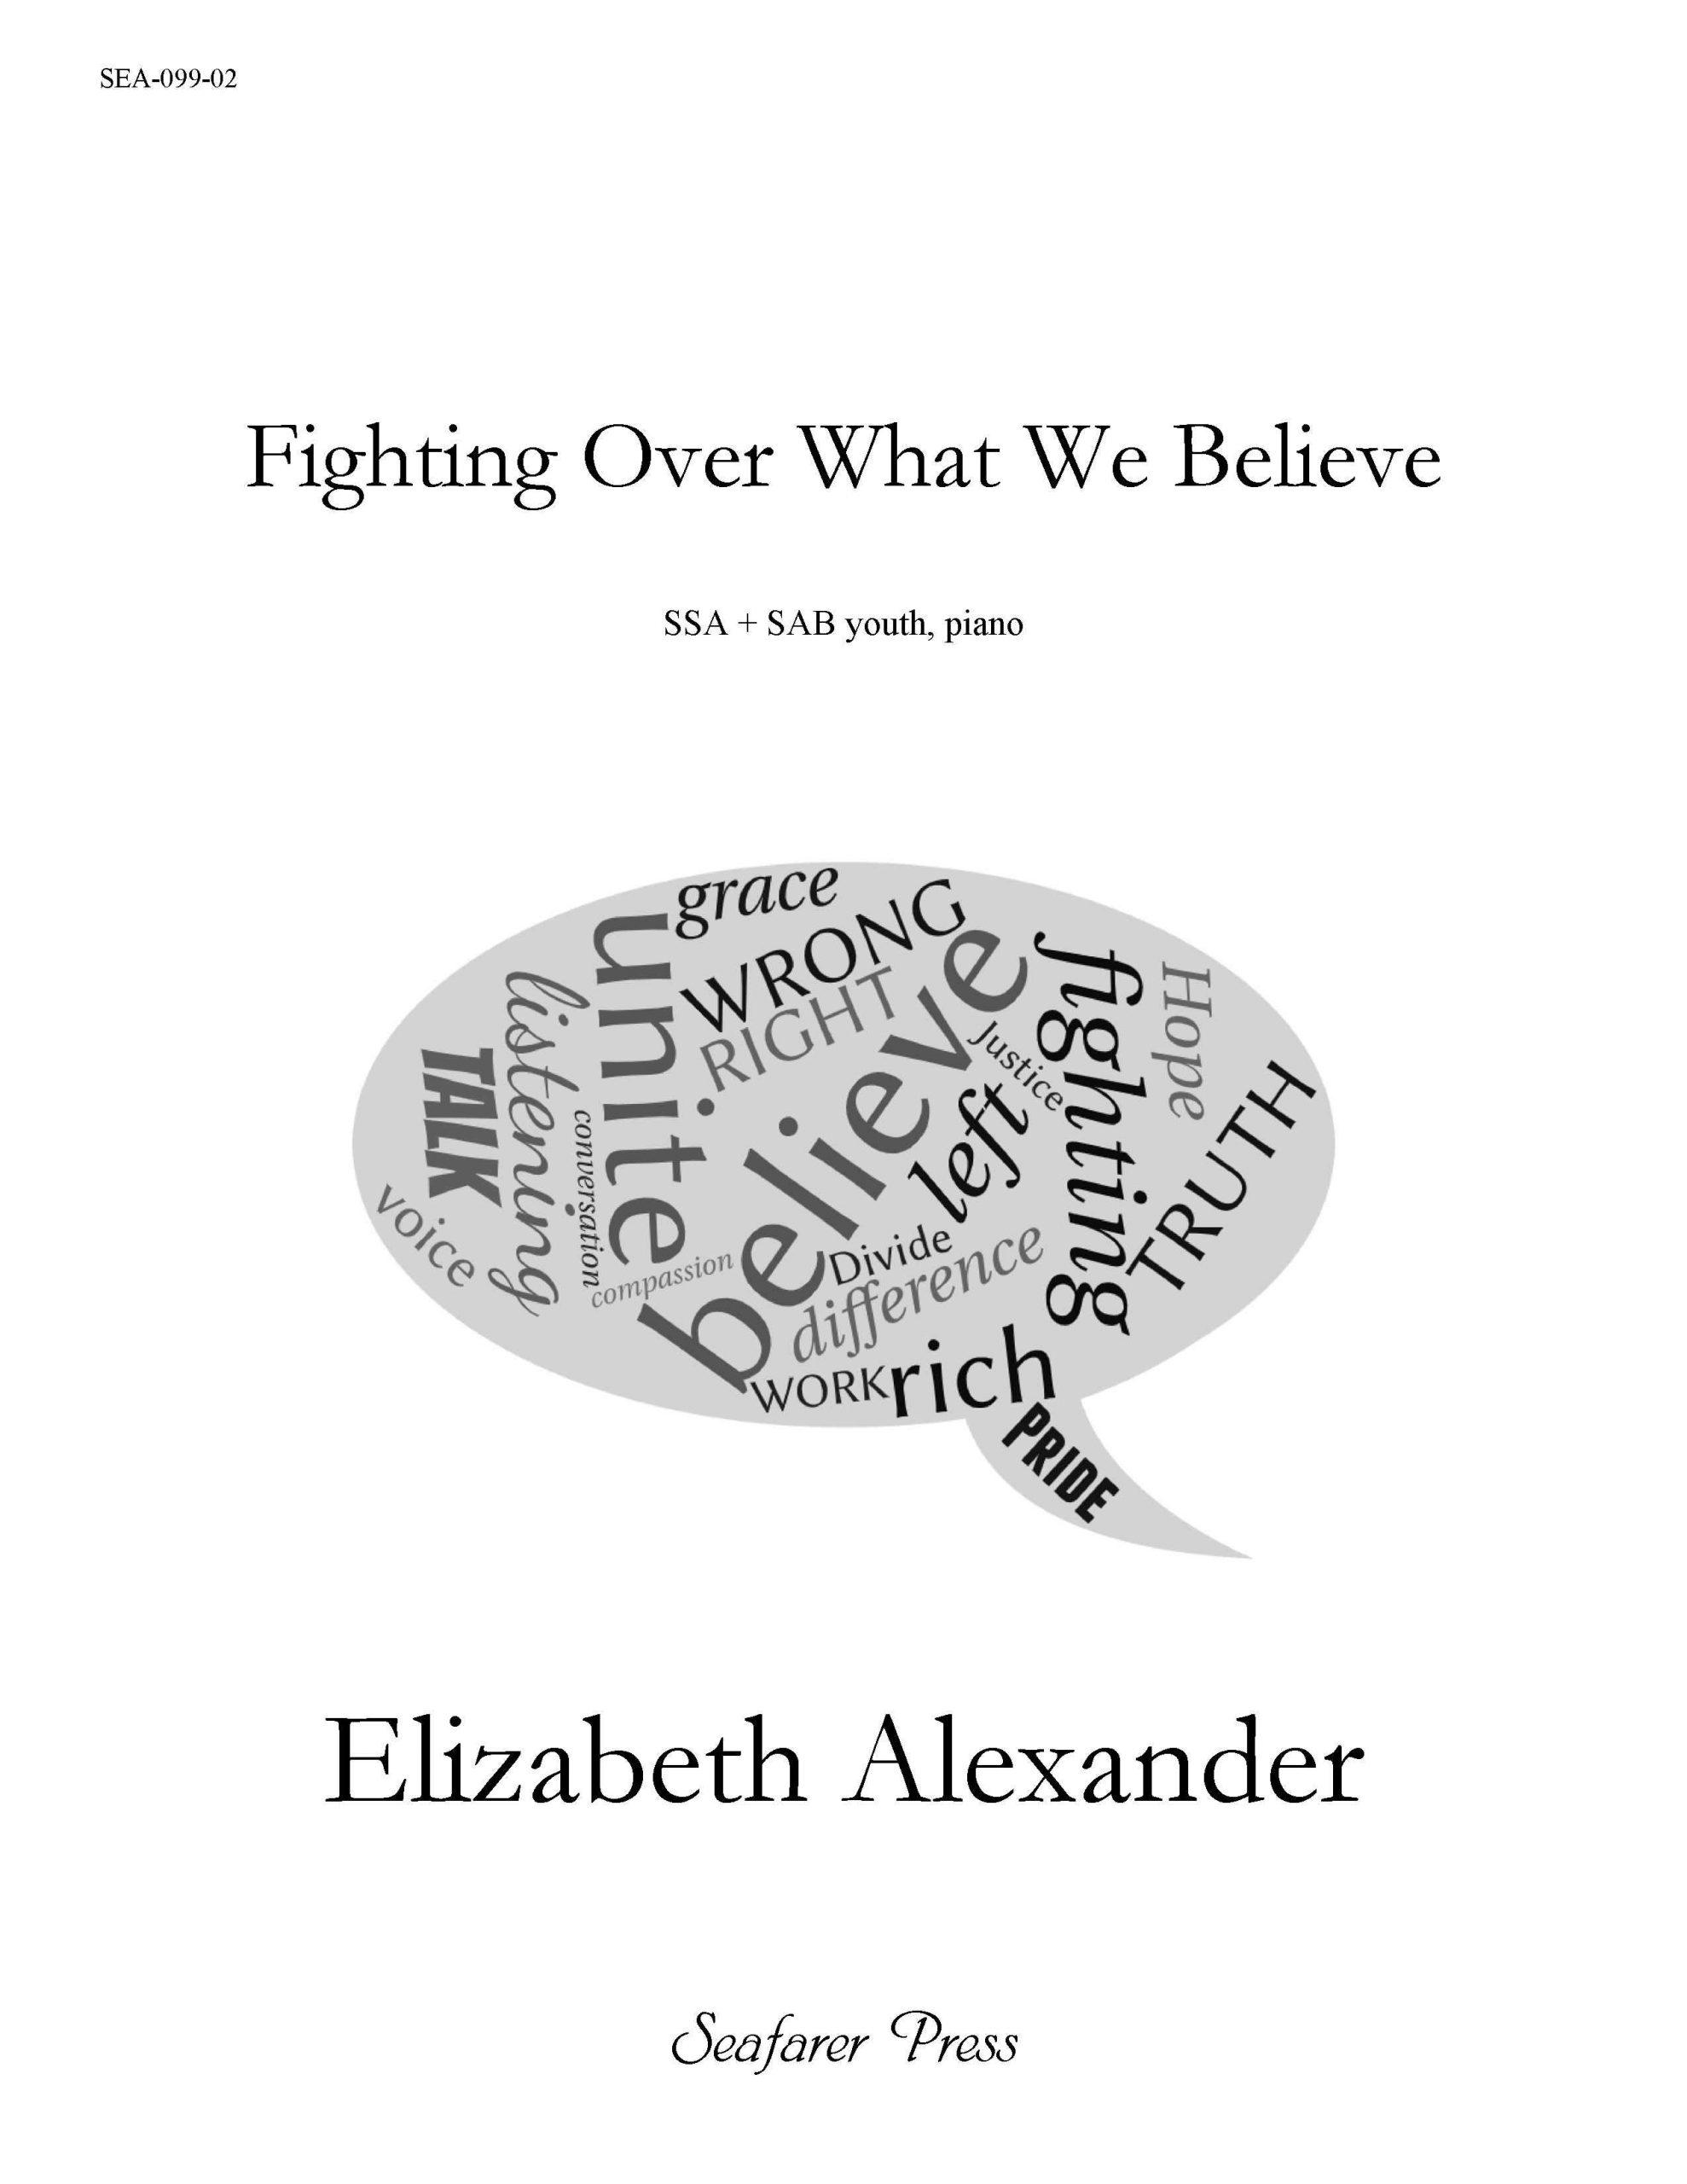 SEA-099-02 - Fighting Over What We Believe